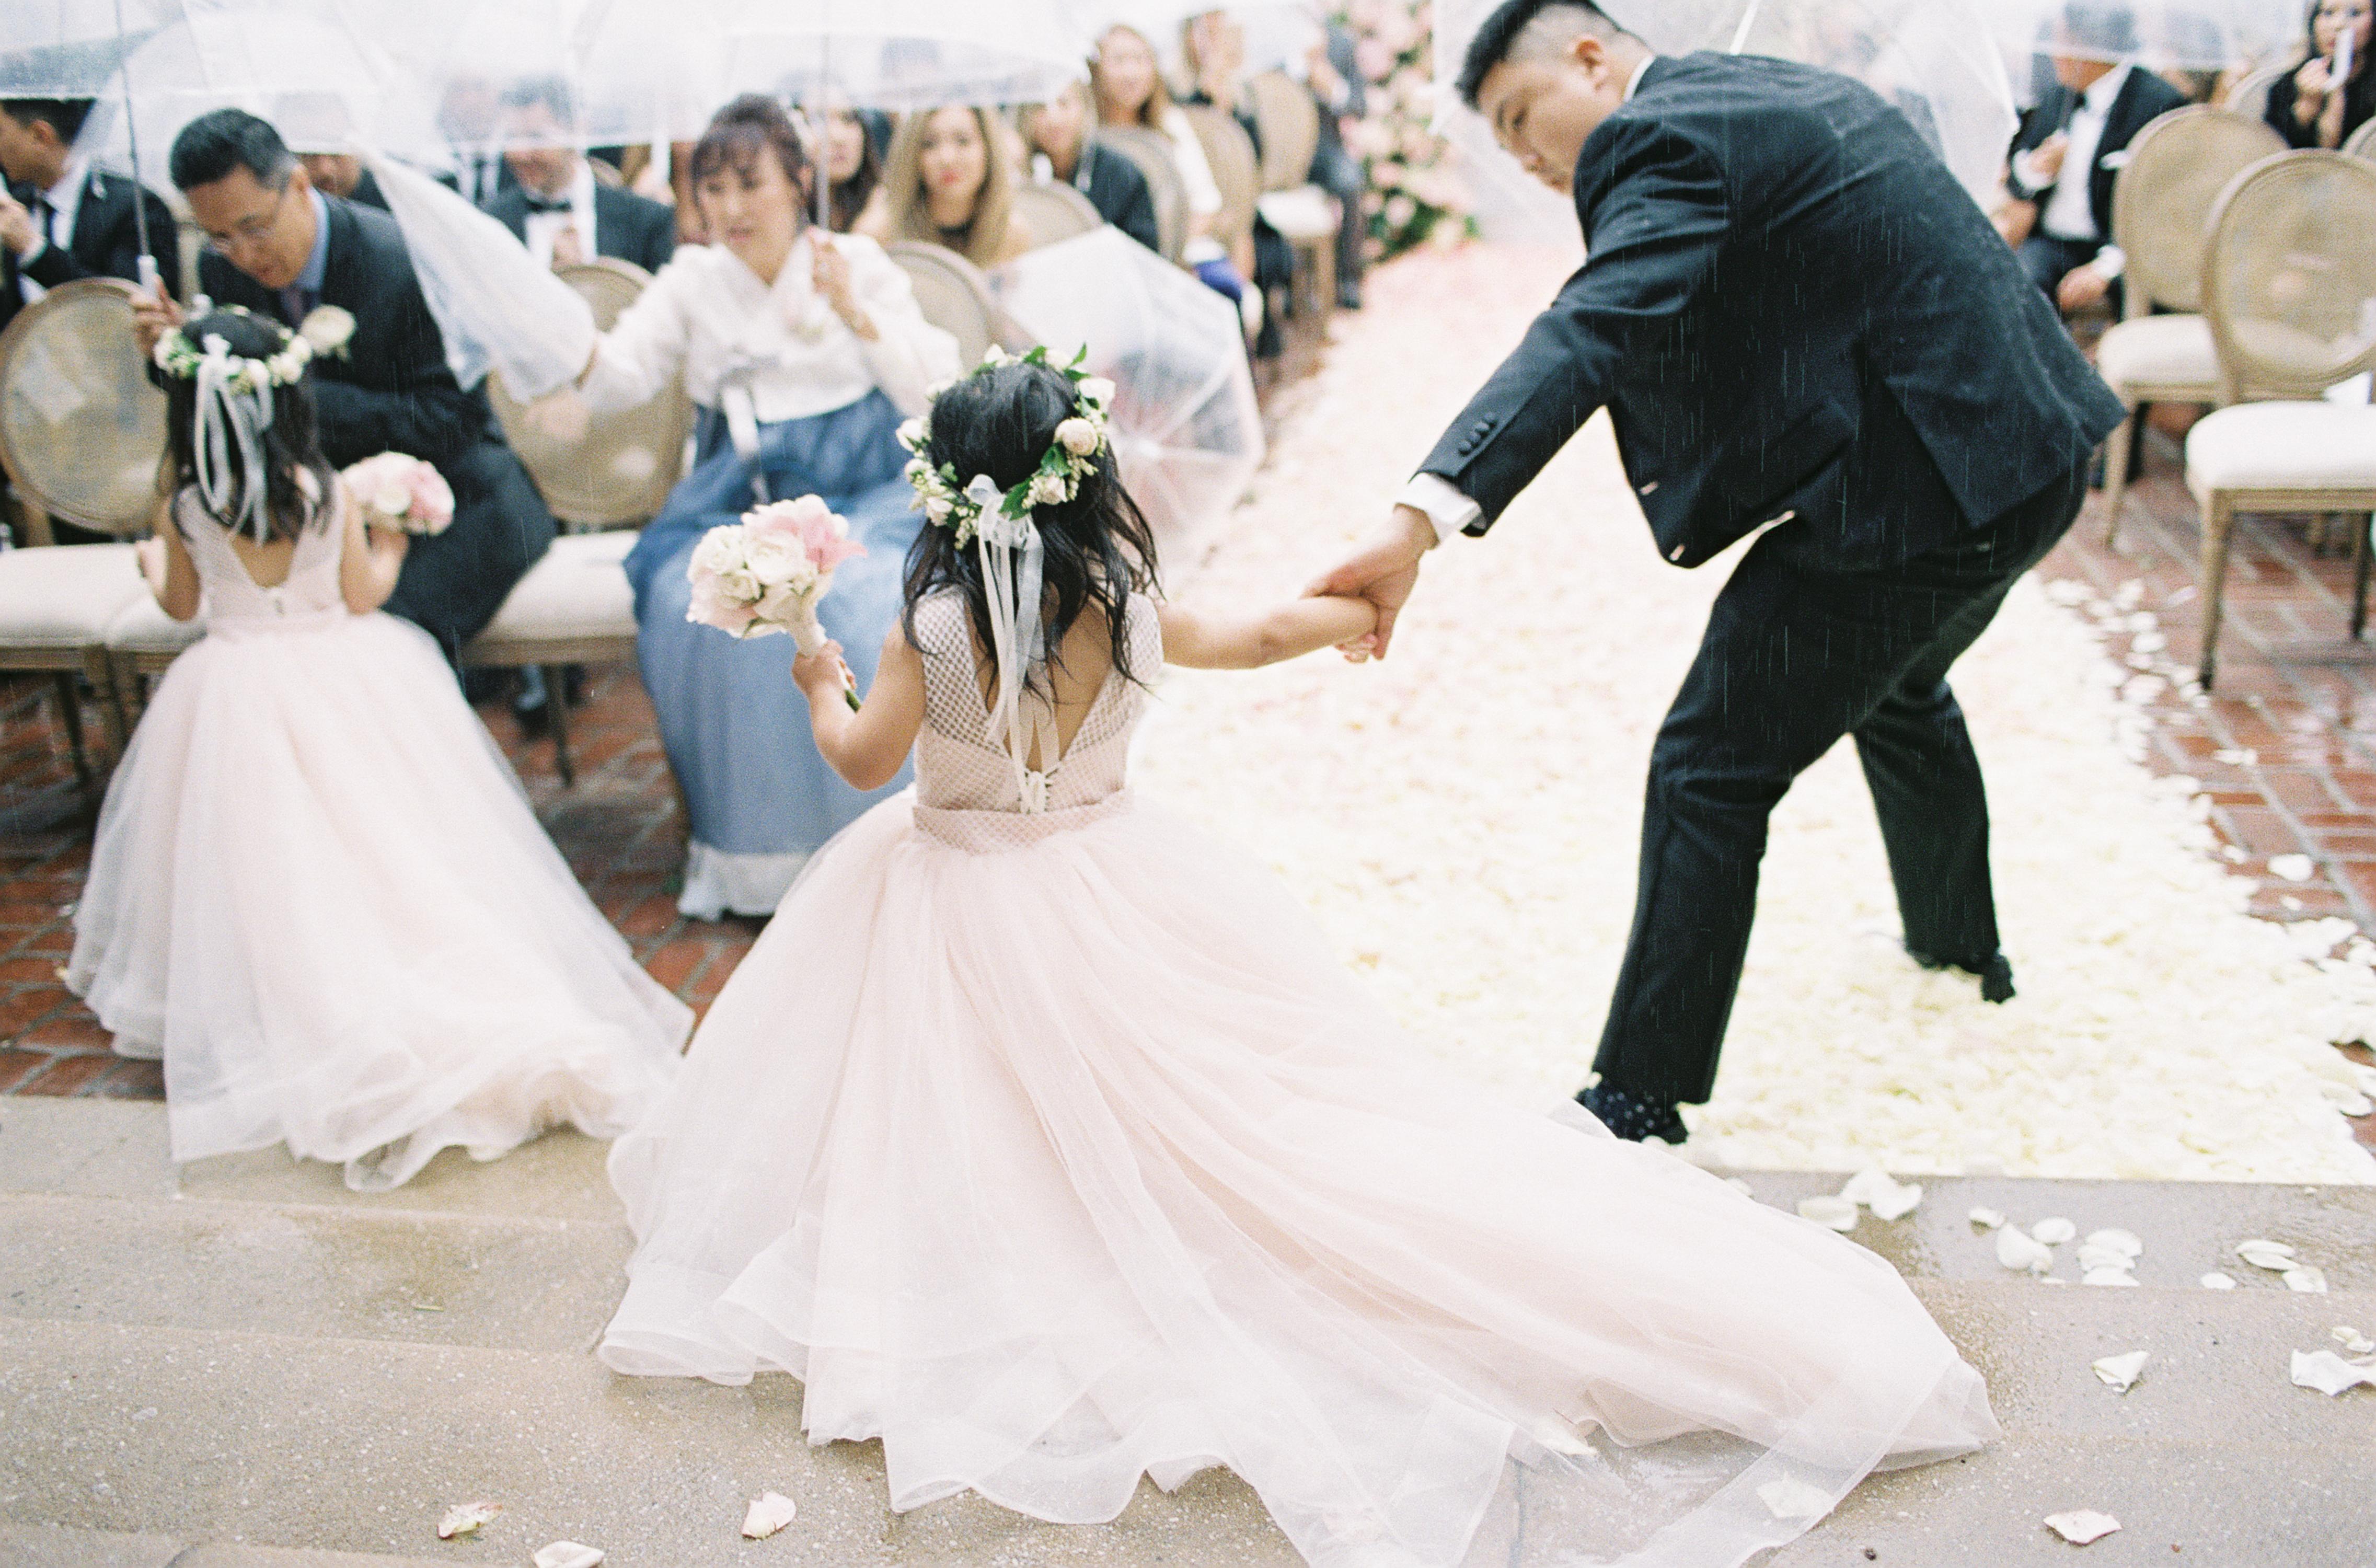 Athenaeum_Wedding_Hi_Res-53-Jen_Huang-005184-R1-025